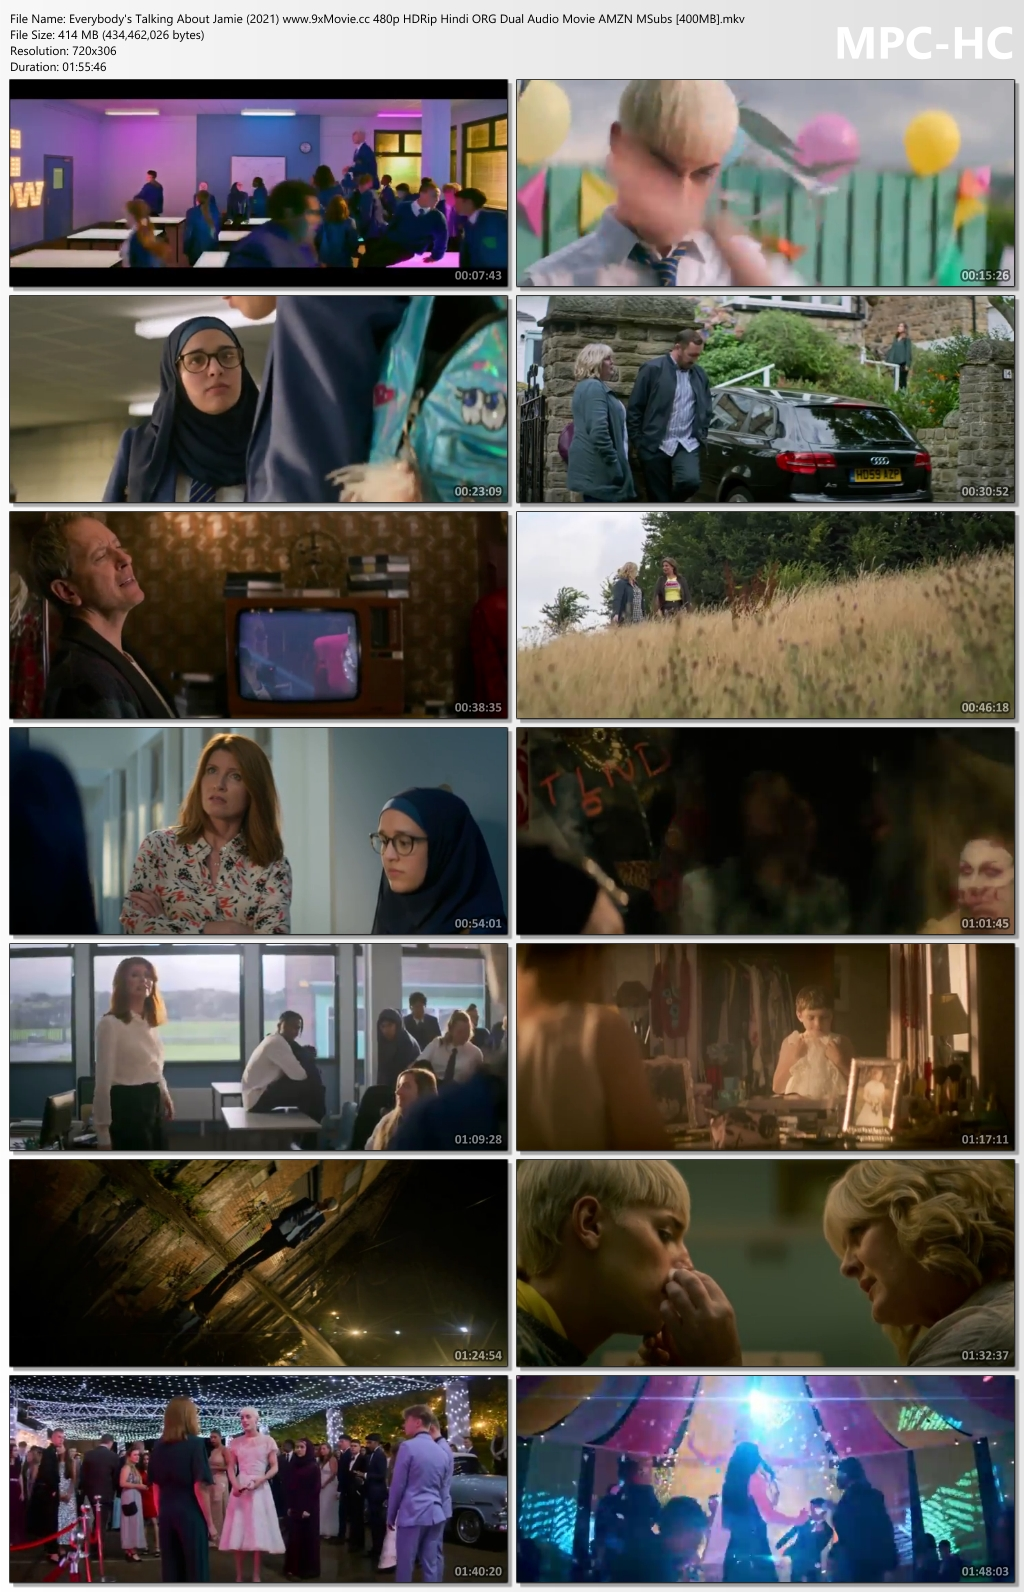 Everybody-s-Talking-About-Jamie-2021-www-9x-Movie-cc-480p-HDRip-Hindi-ORG-Dual-Audio-Movie-AMZN-MSub